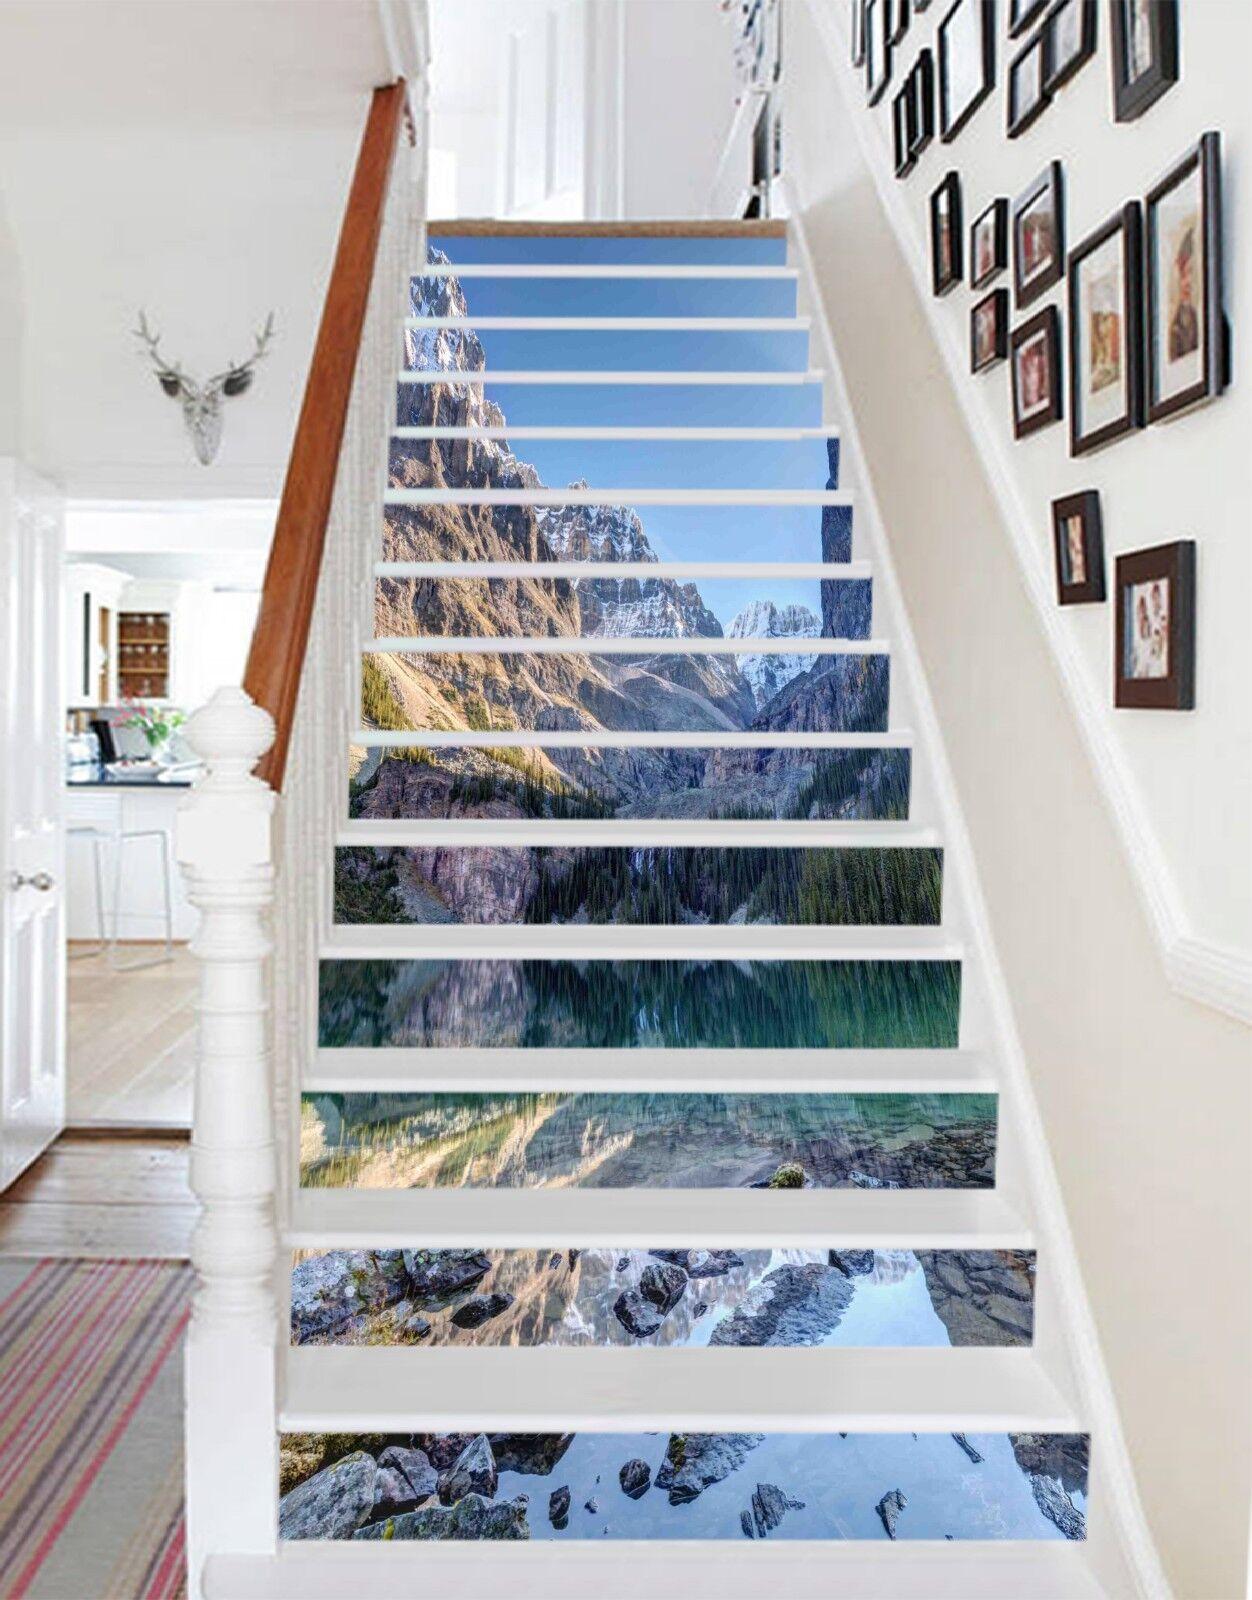 3D Hills Lake 3 Stair Risers Decoration Photo Mural Vinyl Decal WandPapier CA